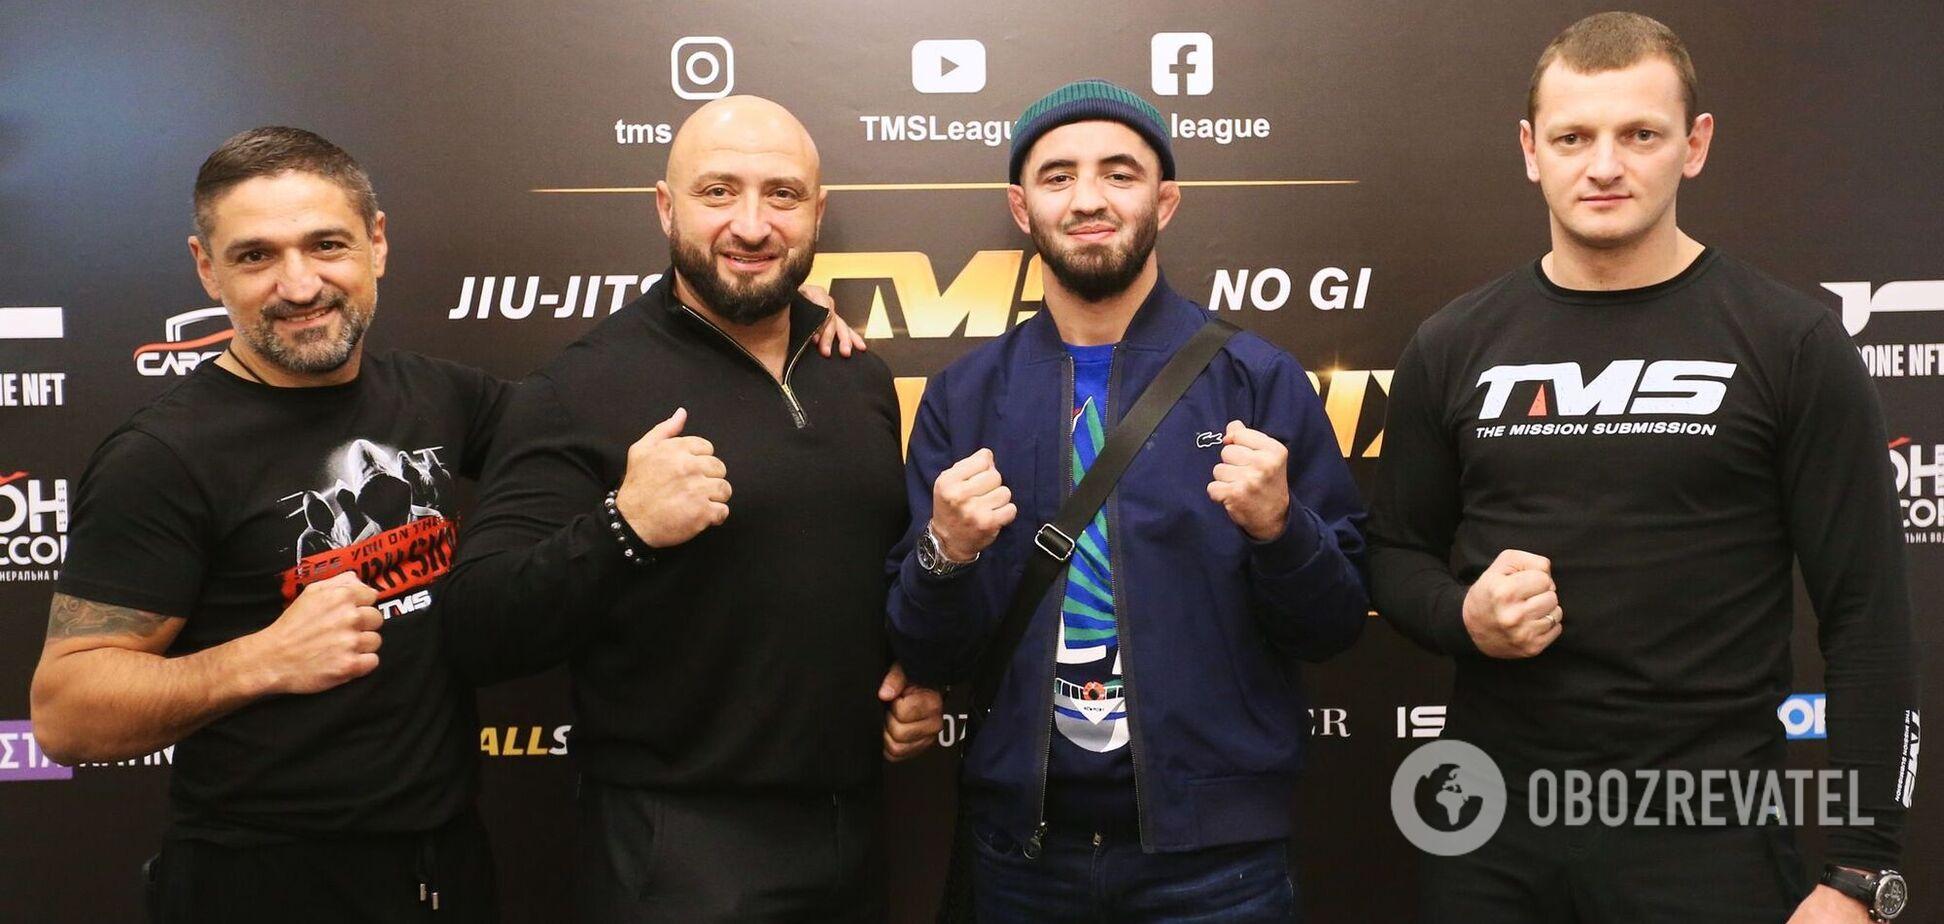 Боец UFC Людвик Шолинян стал гостем жеребьевки турнира TMS GRAND PRIX